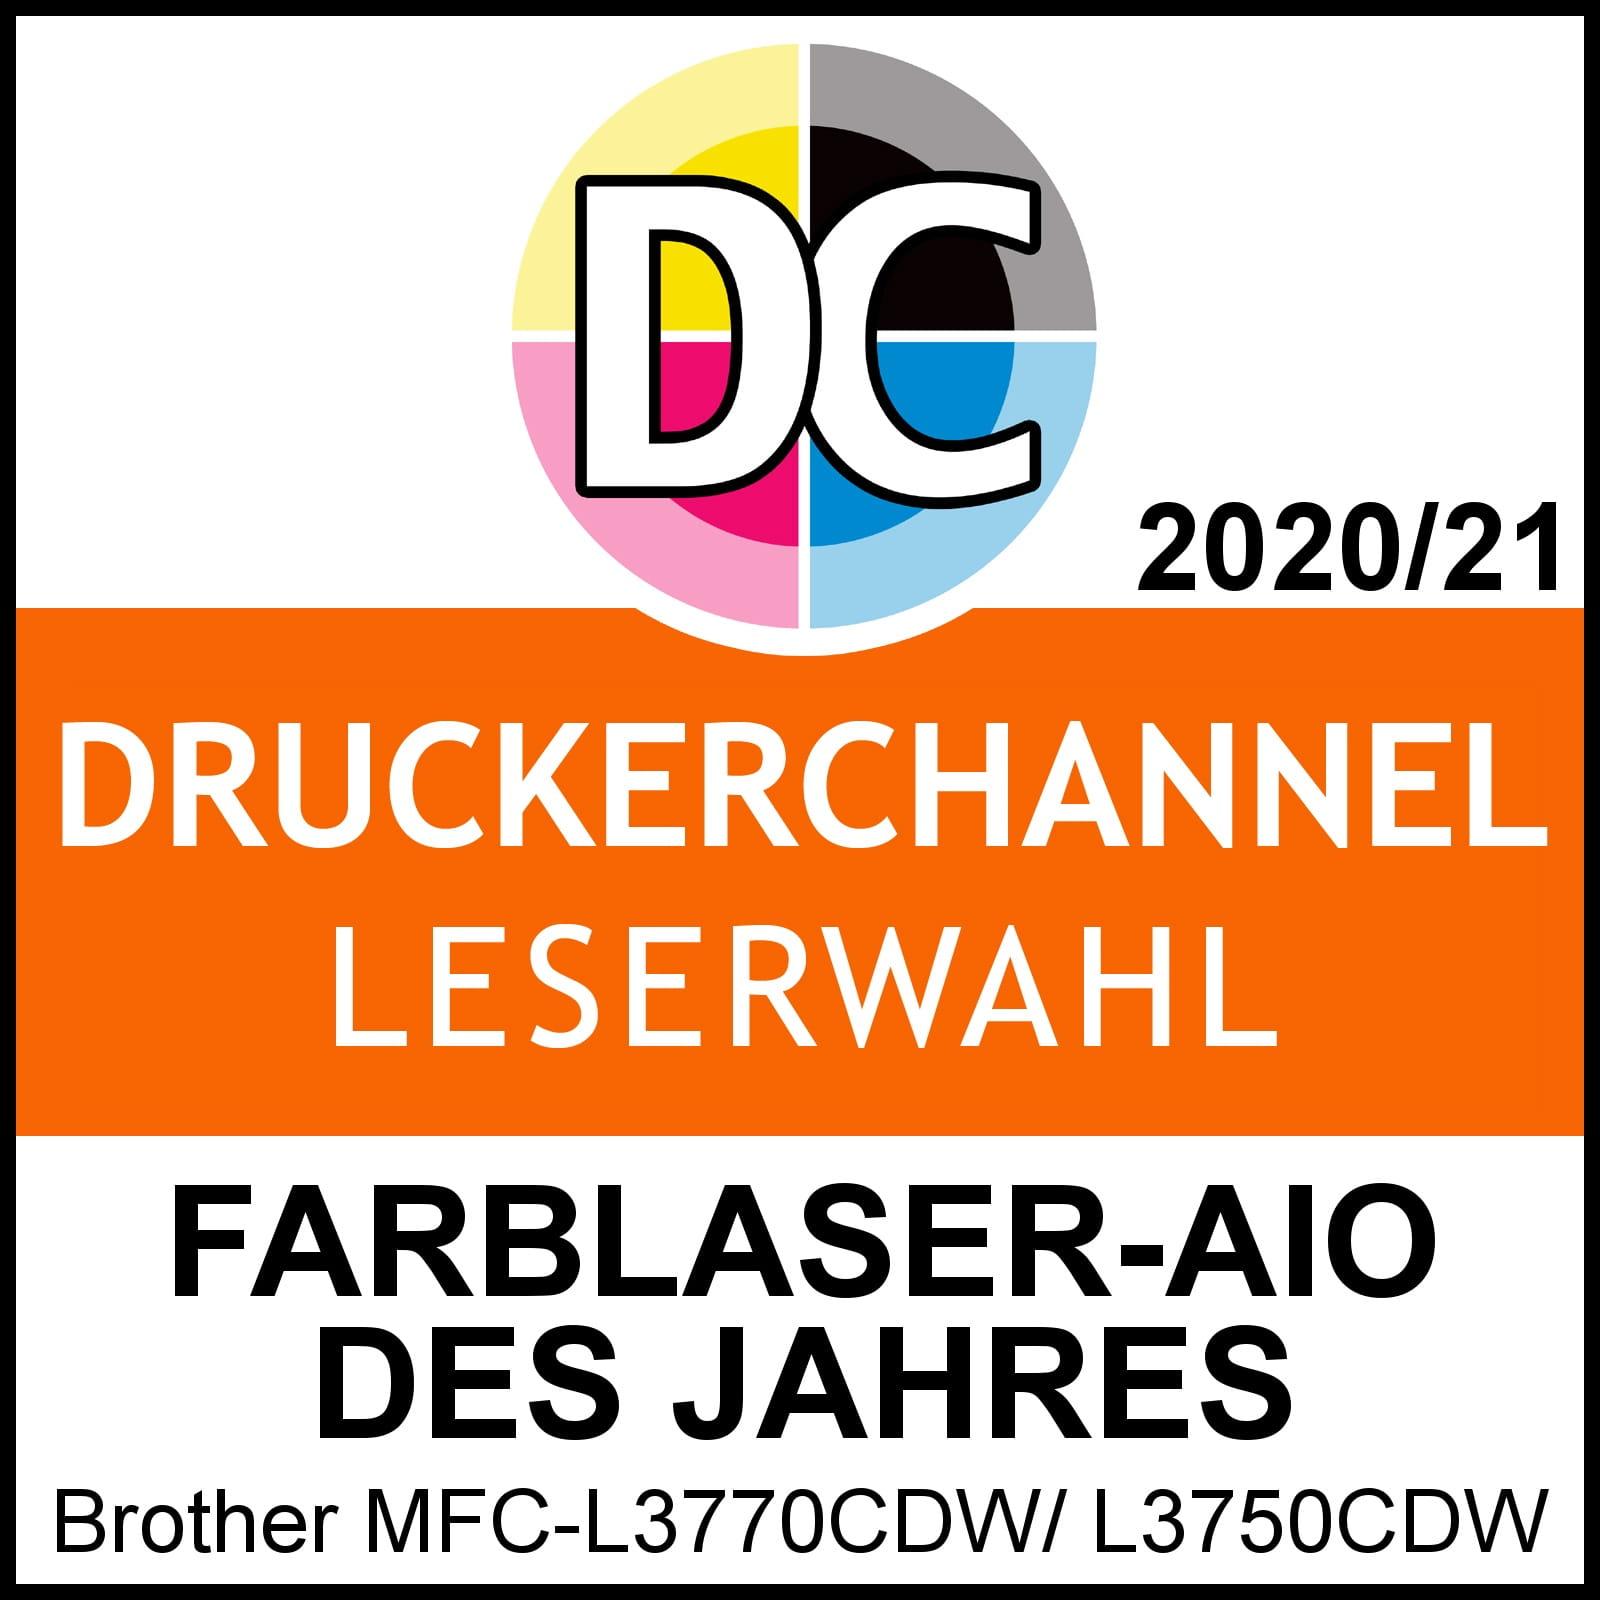 Druckerchannel_mfc_l3750cdw_l3770cdw